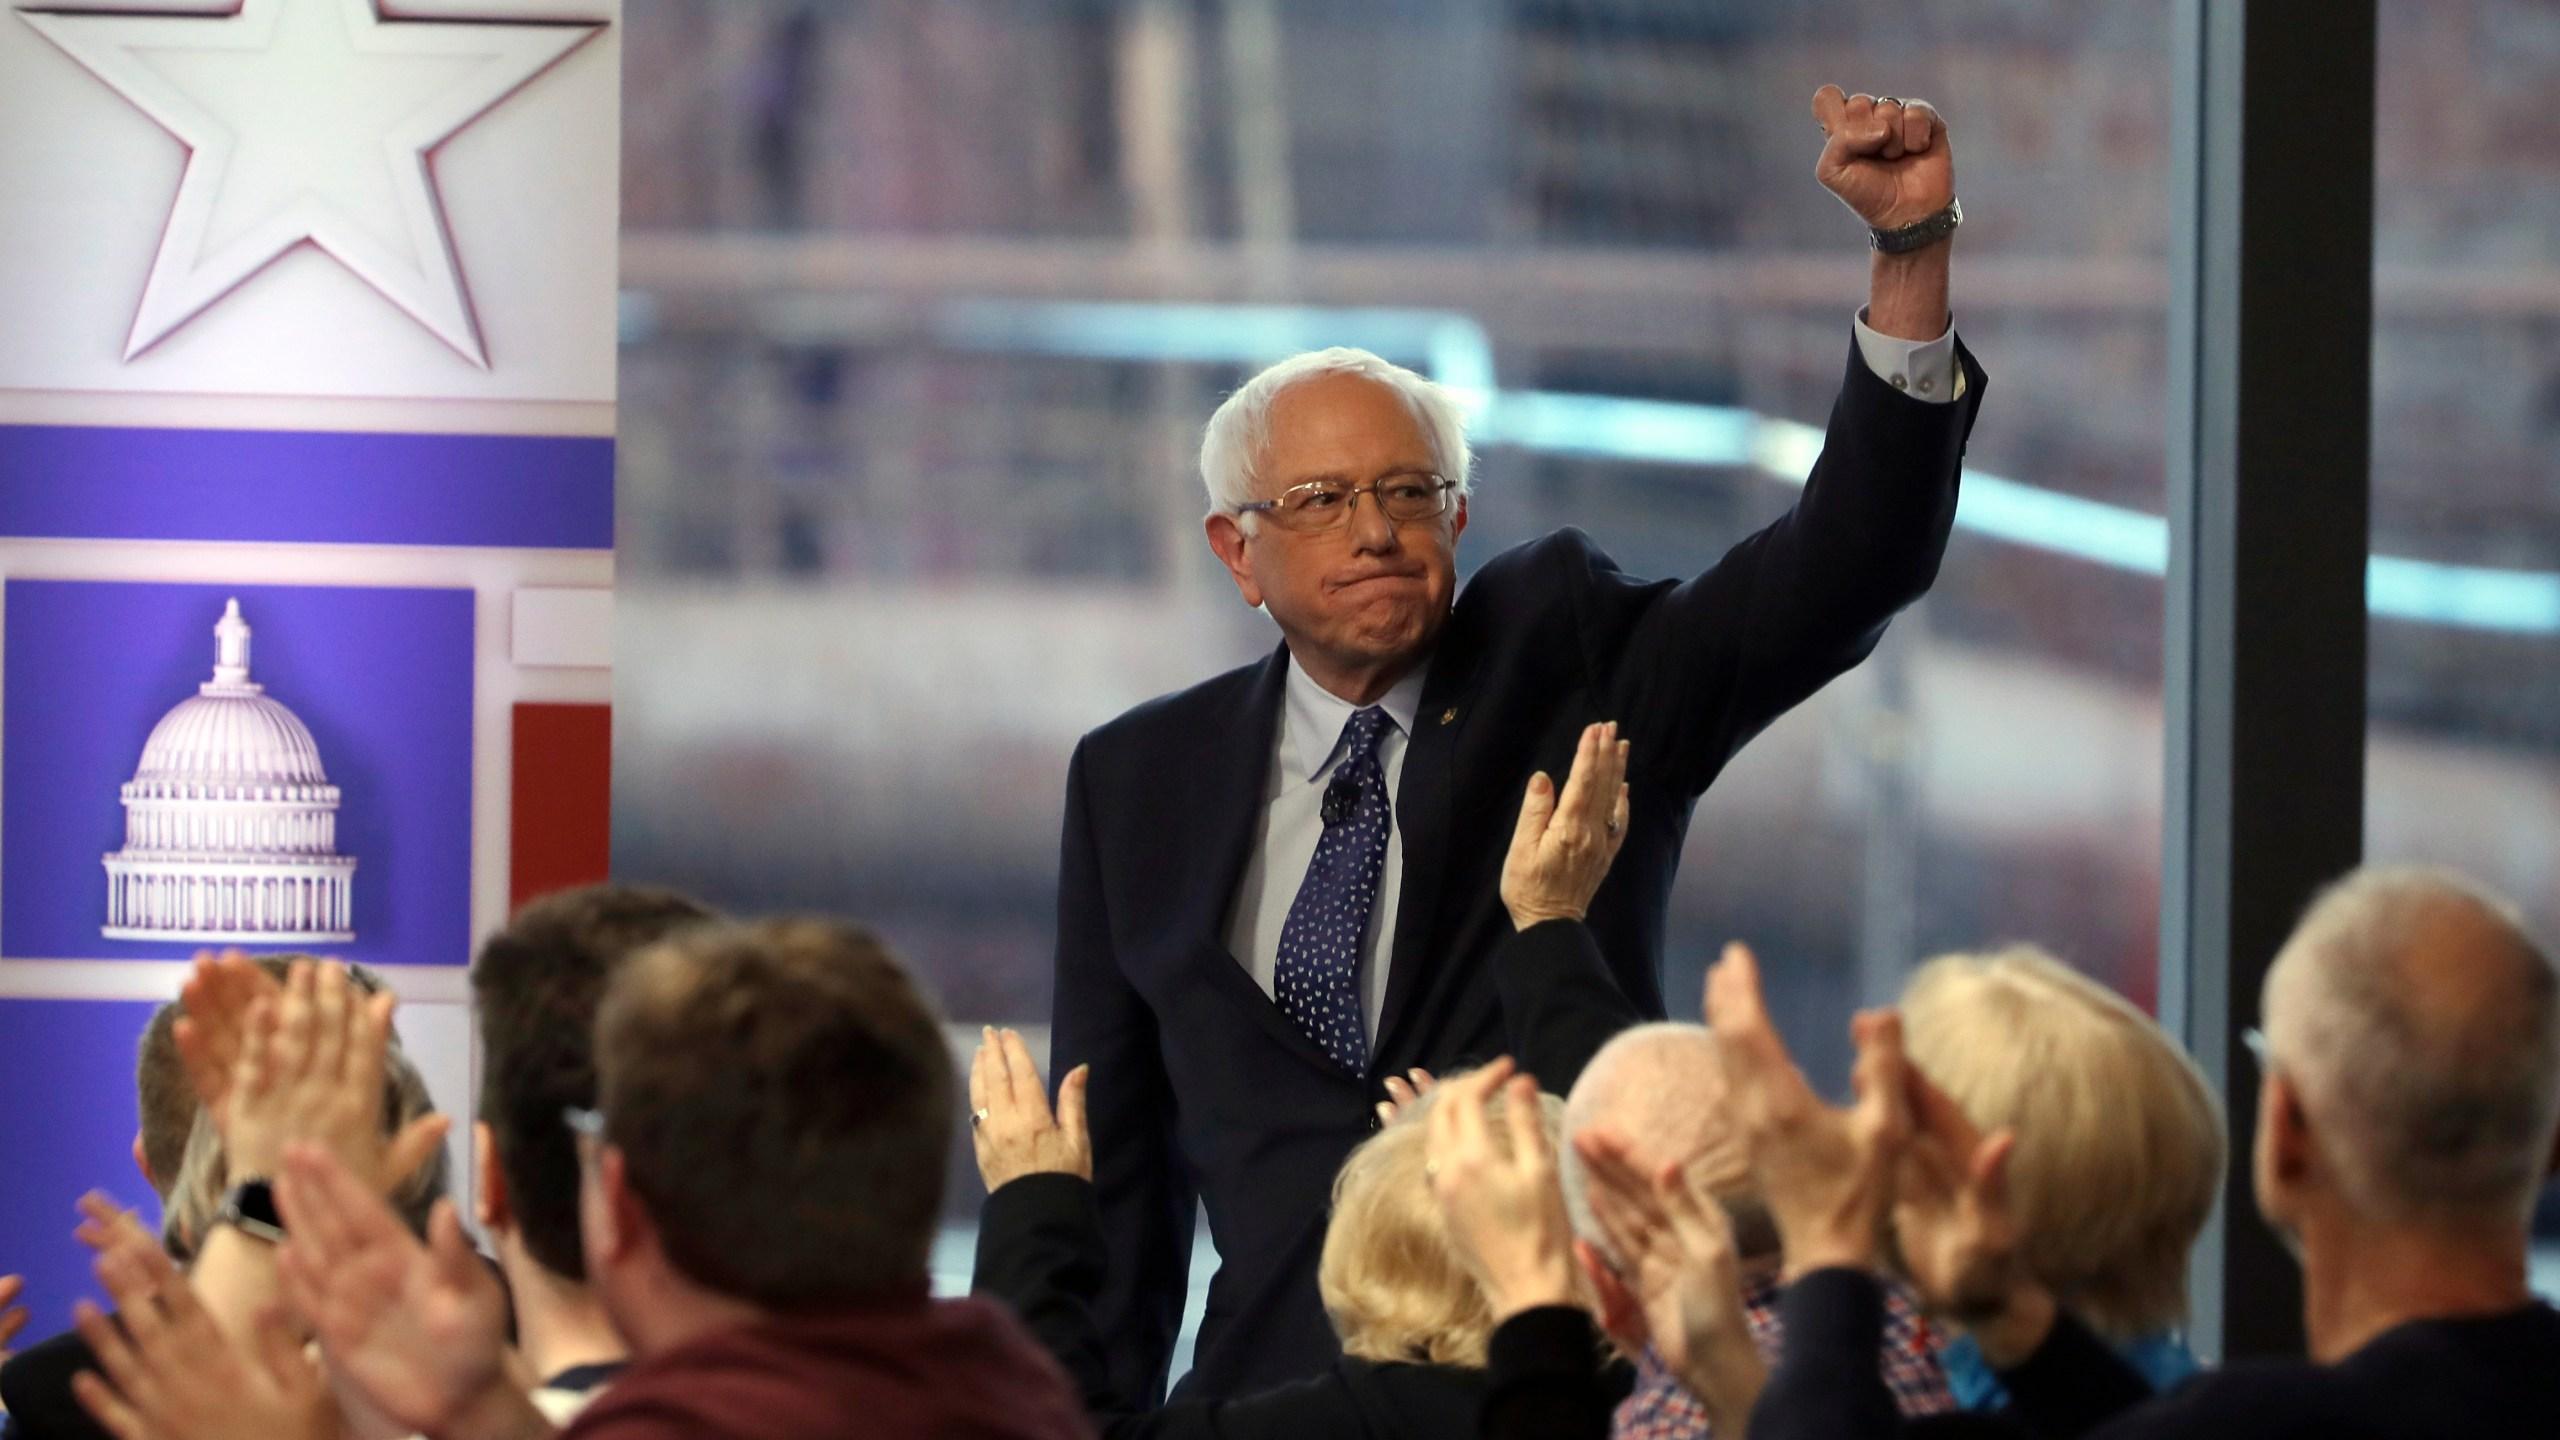 APTOPIX_Election_2020_Bernie_Sanders_35372-159532.jpg79361294